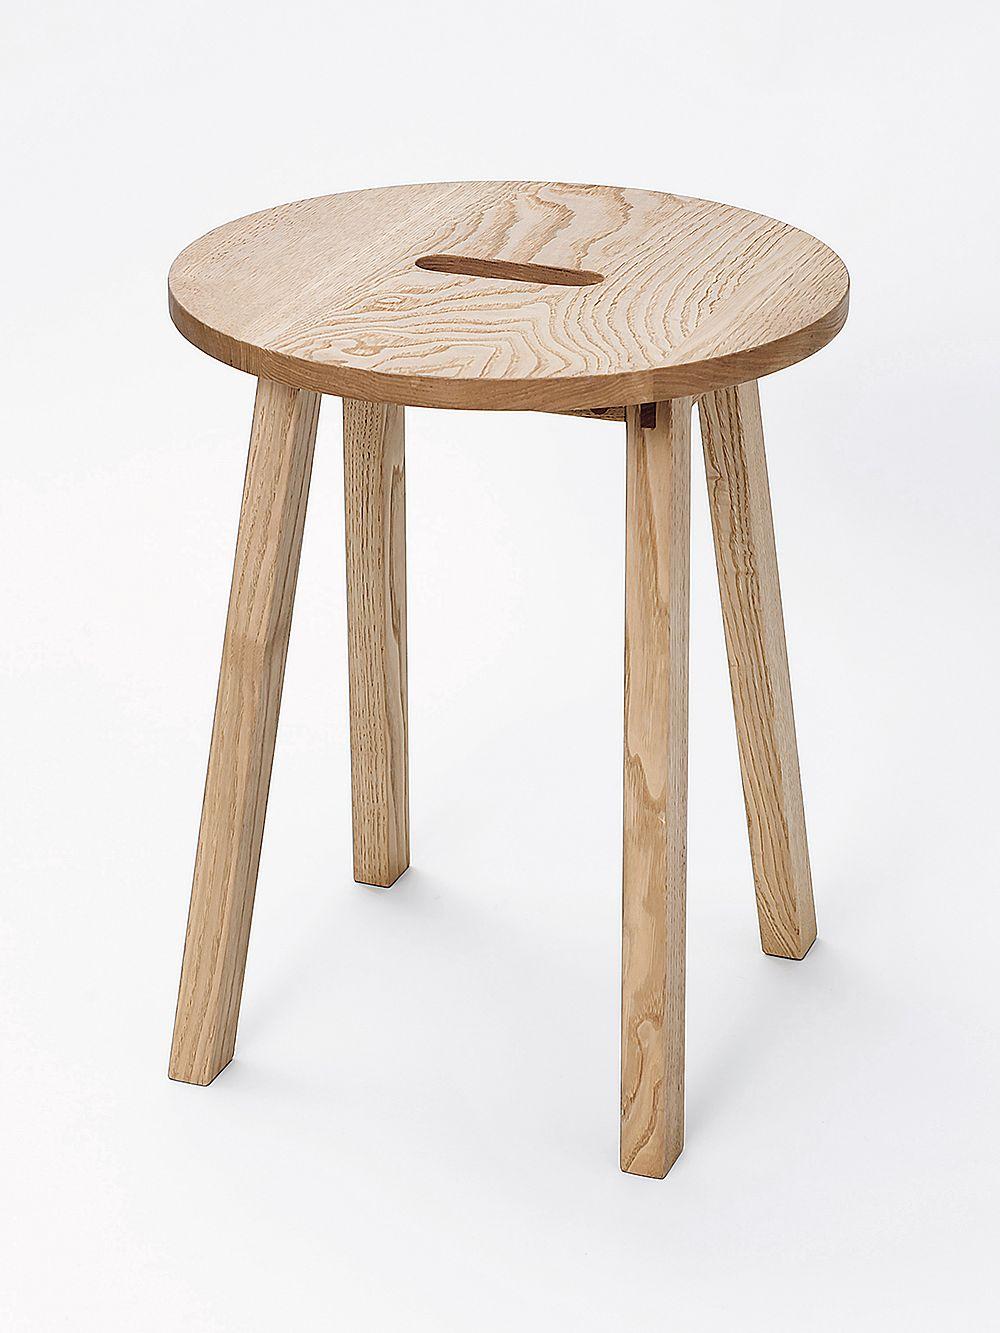 Iwatemo HK stool by Harri Koskinen